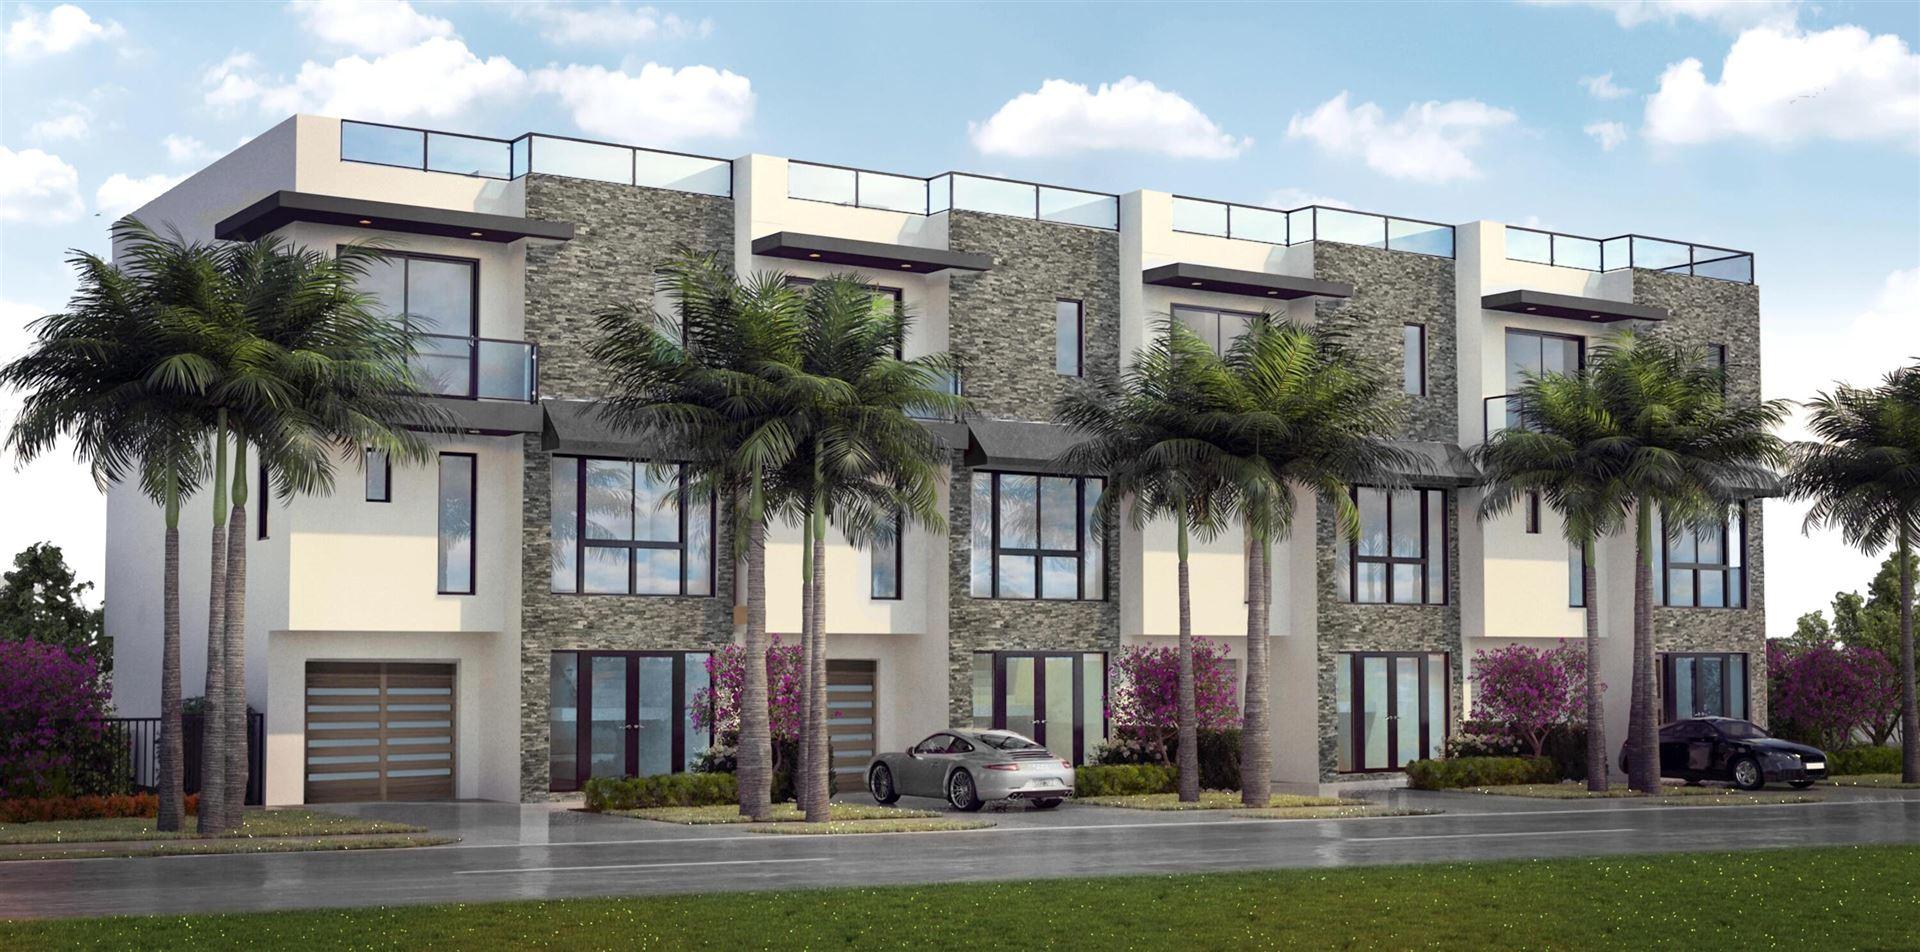 1002 N Riverside Drive, Pompano Beach, FL 33062 - MLS#: RX-10710852